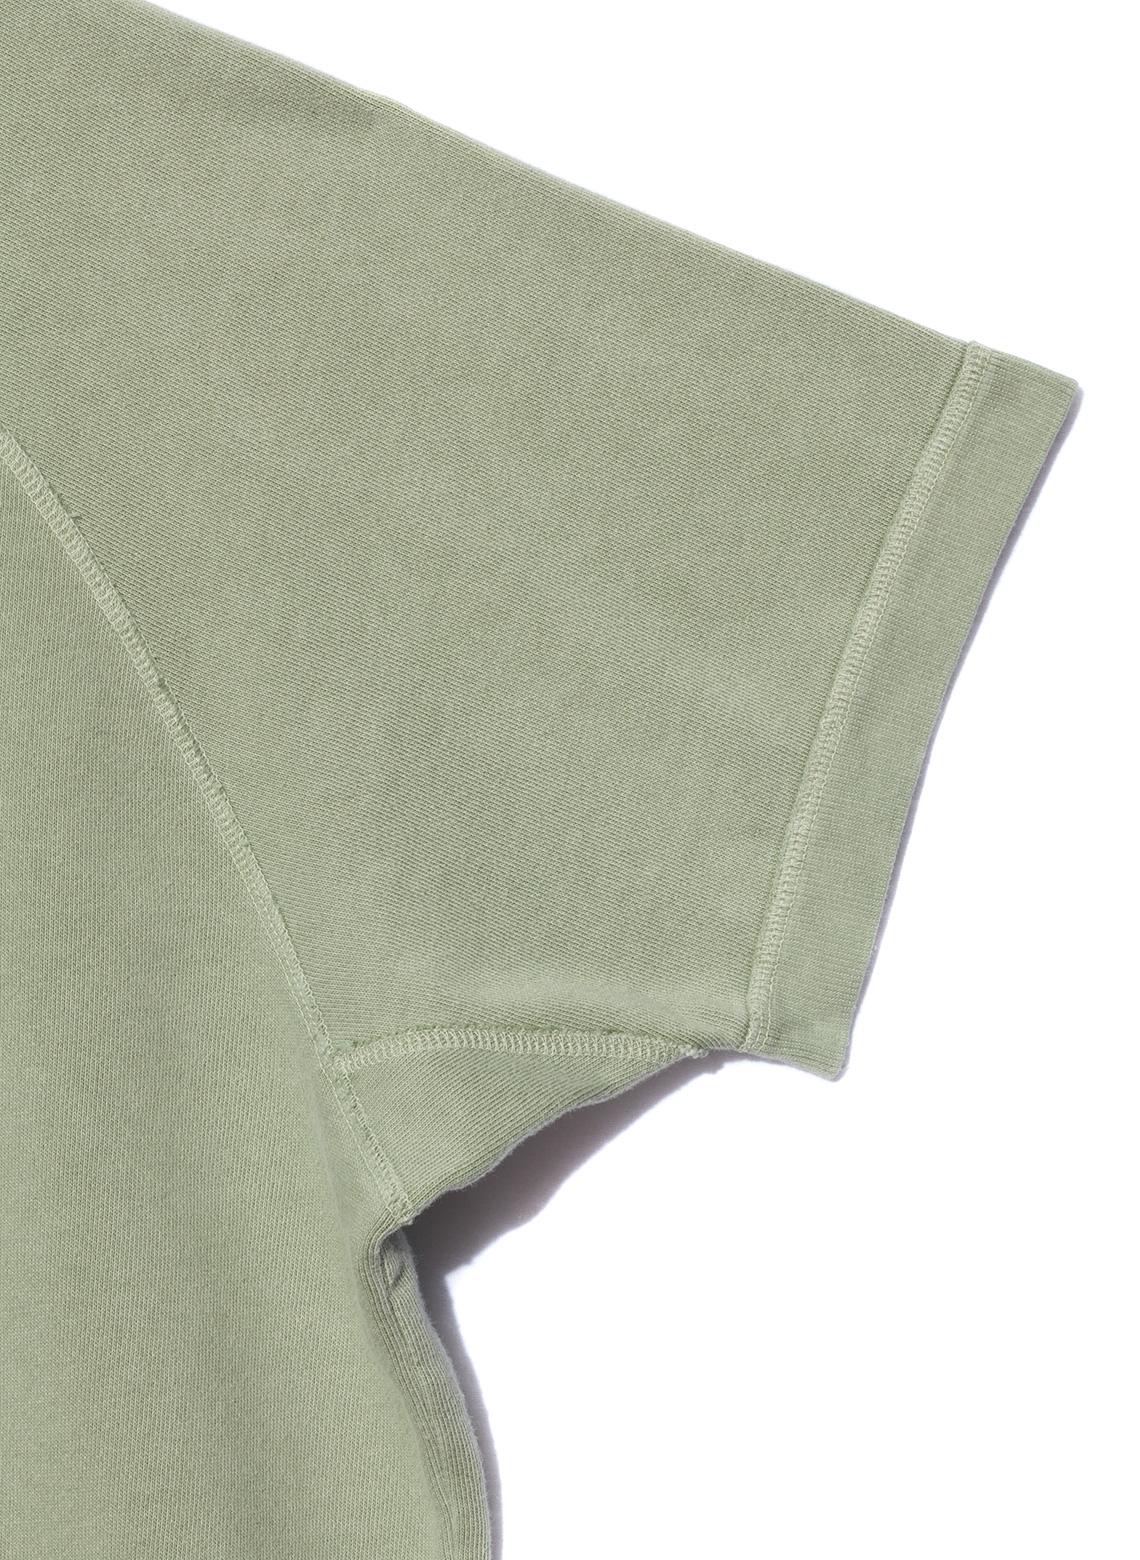 0bc983549329 ... Short Sleeve Crew Cotton Loopback Nigel Cabourn Lybro ...